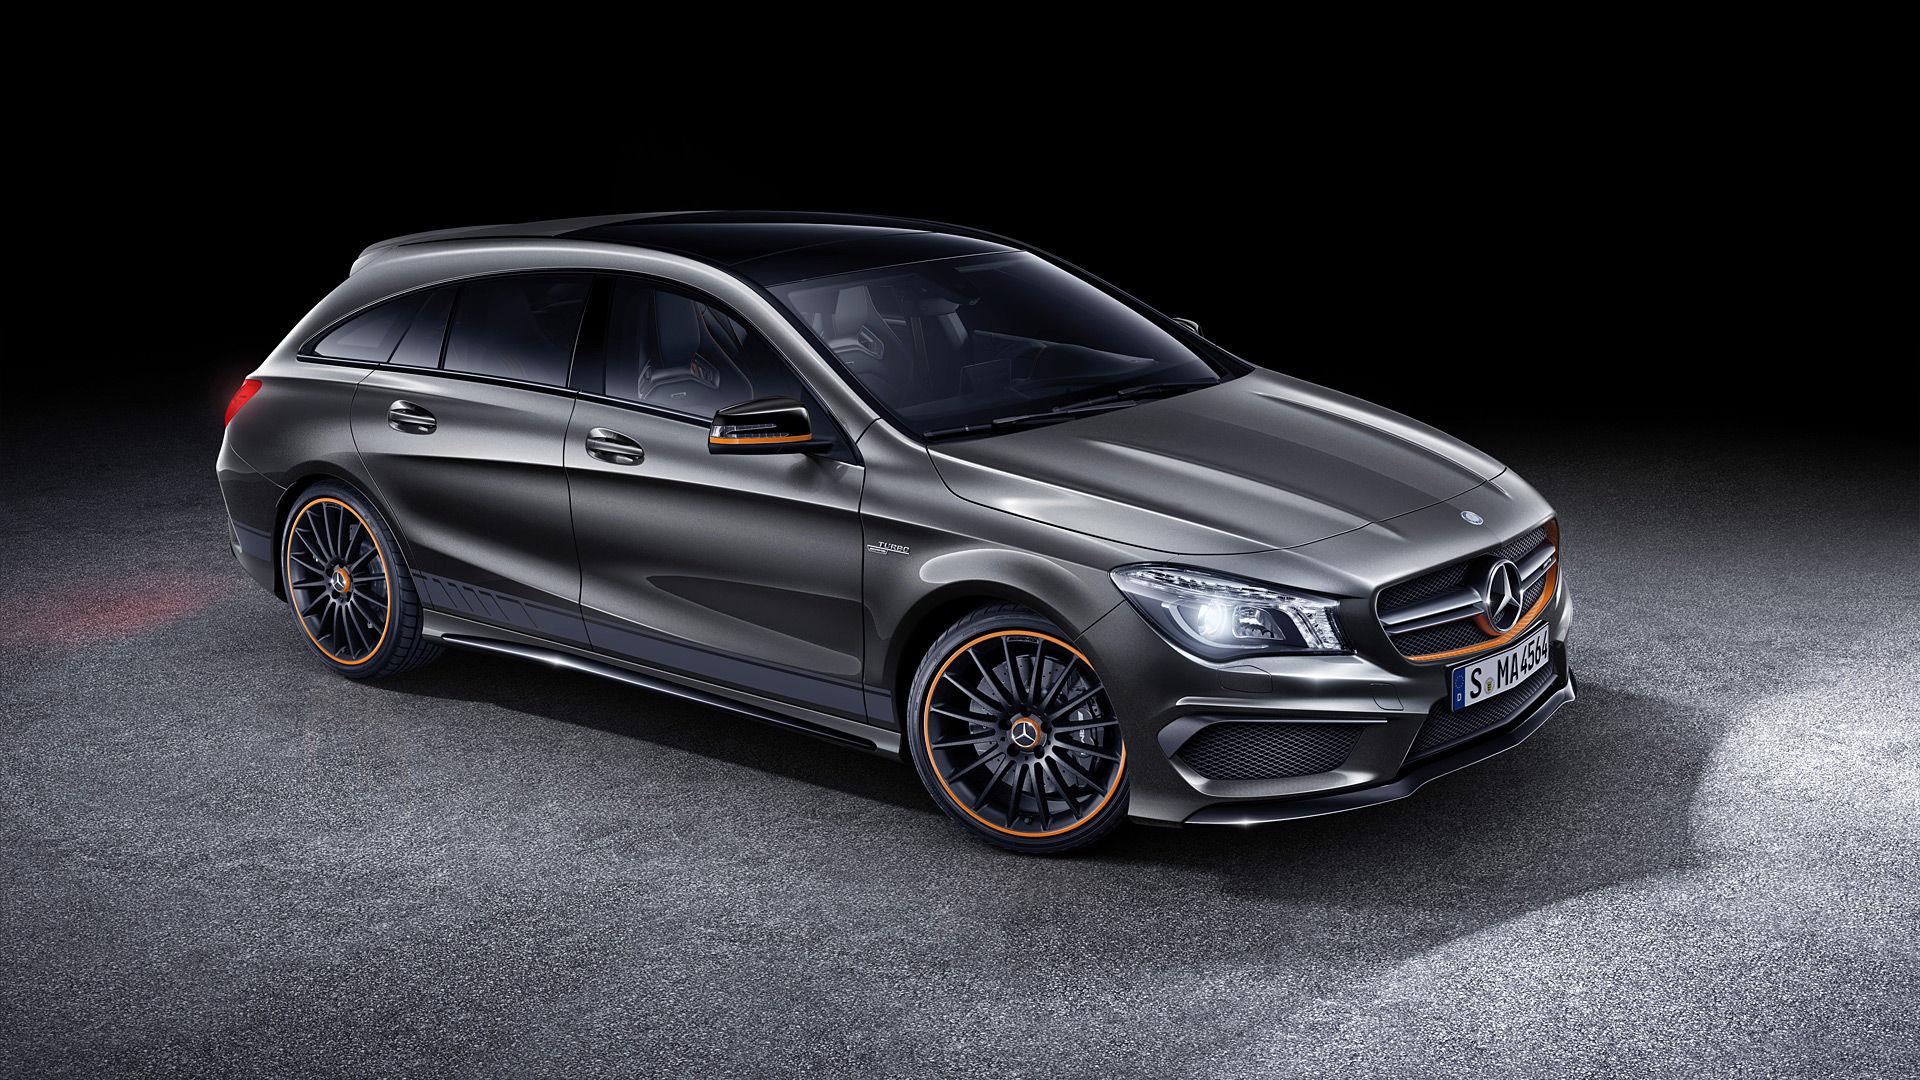 2016 Mercedes-Benz CLA45 AMG Shooting Brake